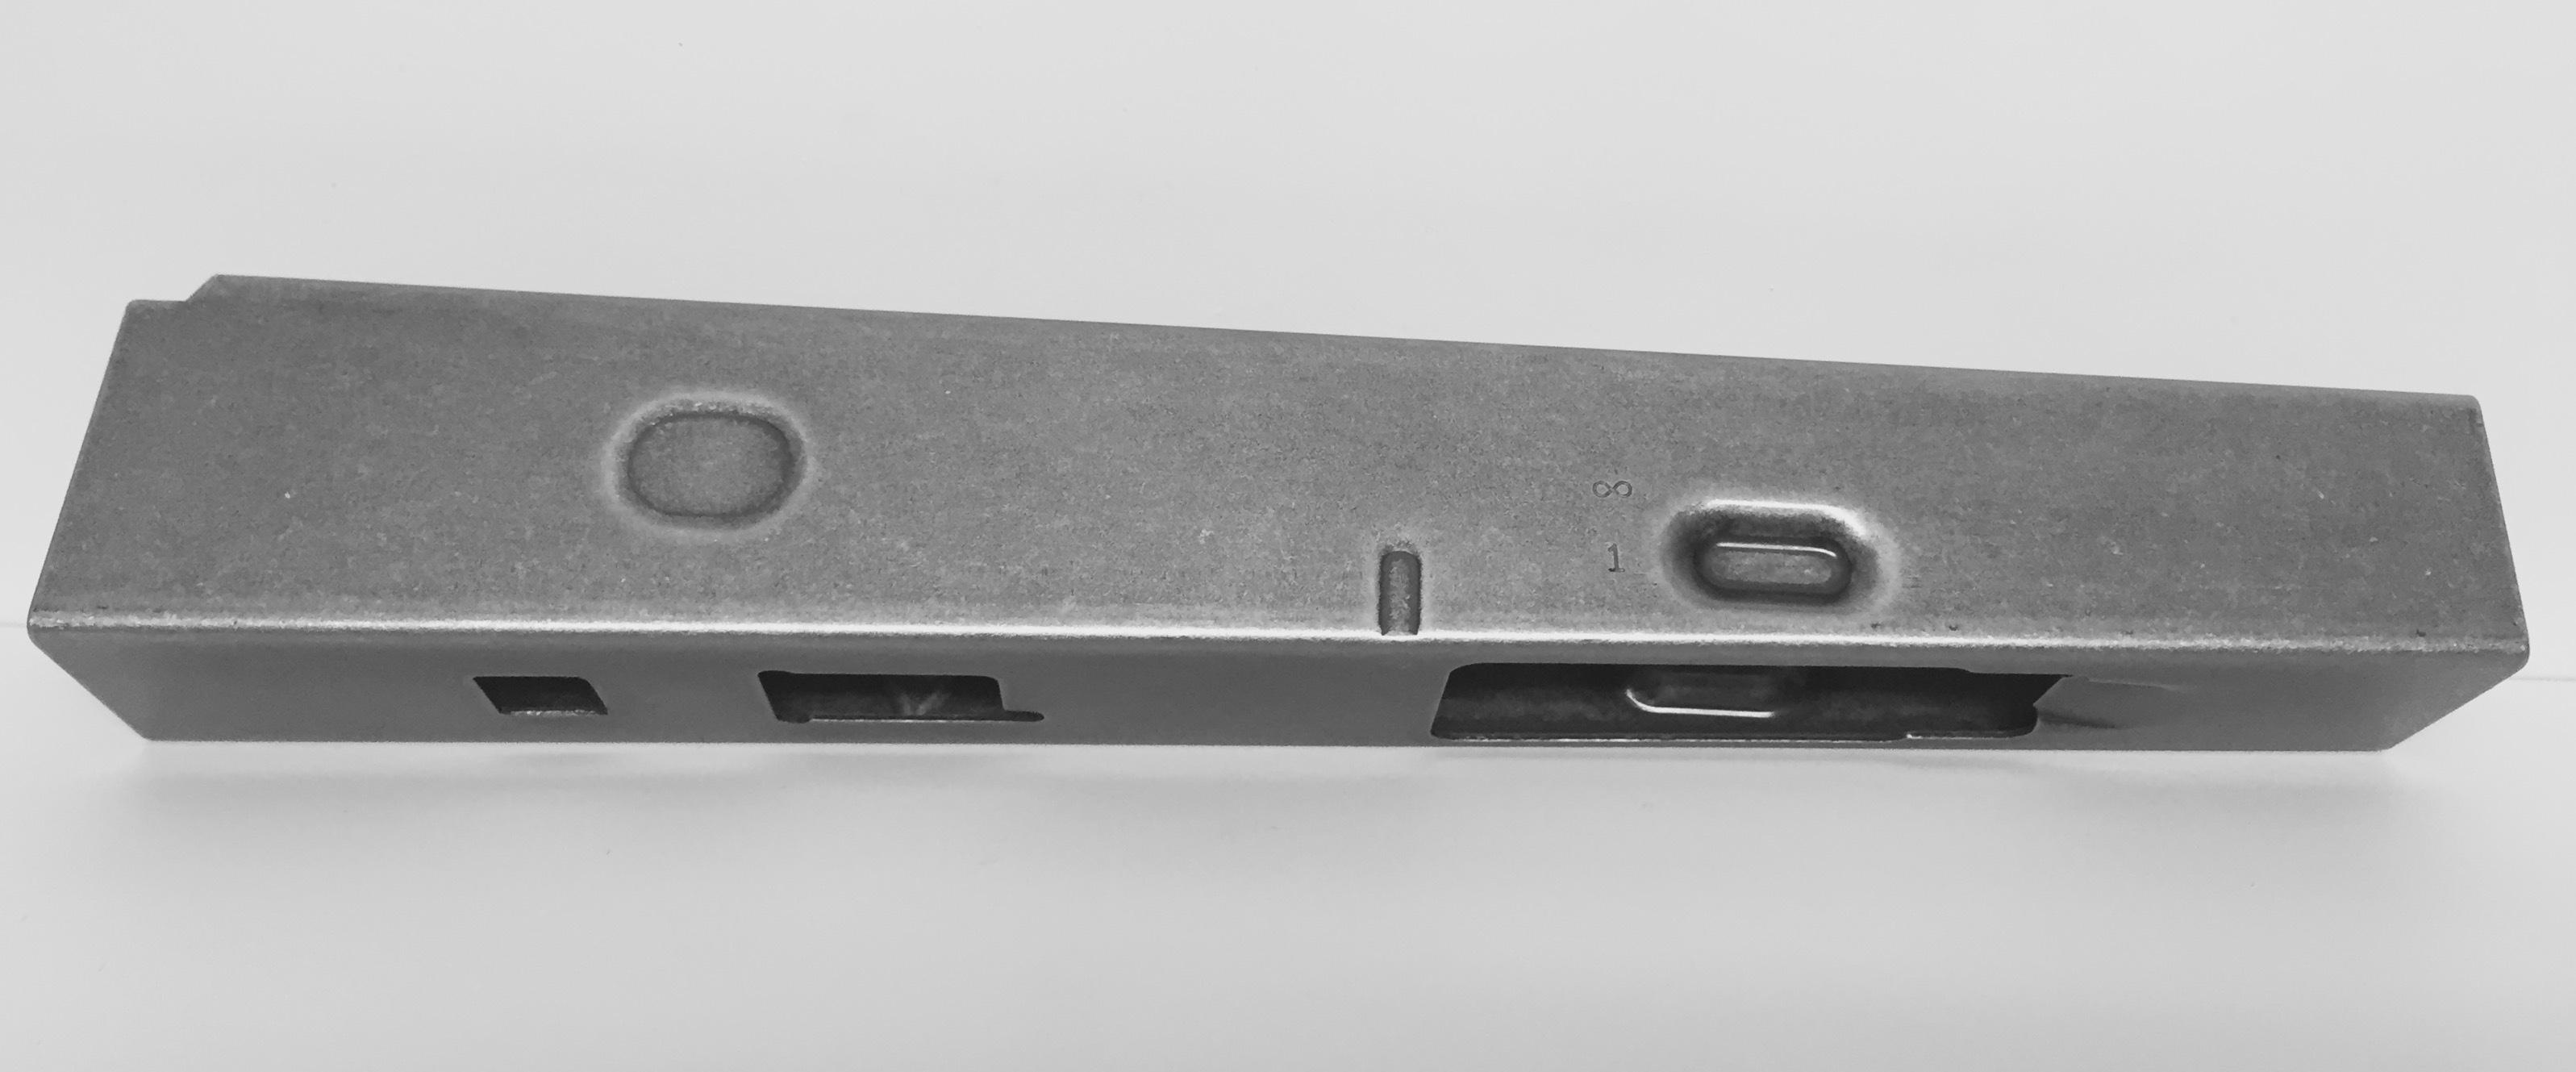 Ak 47 80 receiver - Hungarian Ak Blank Right Side View